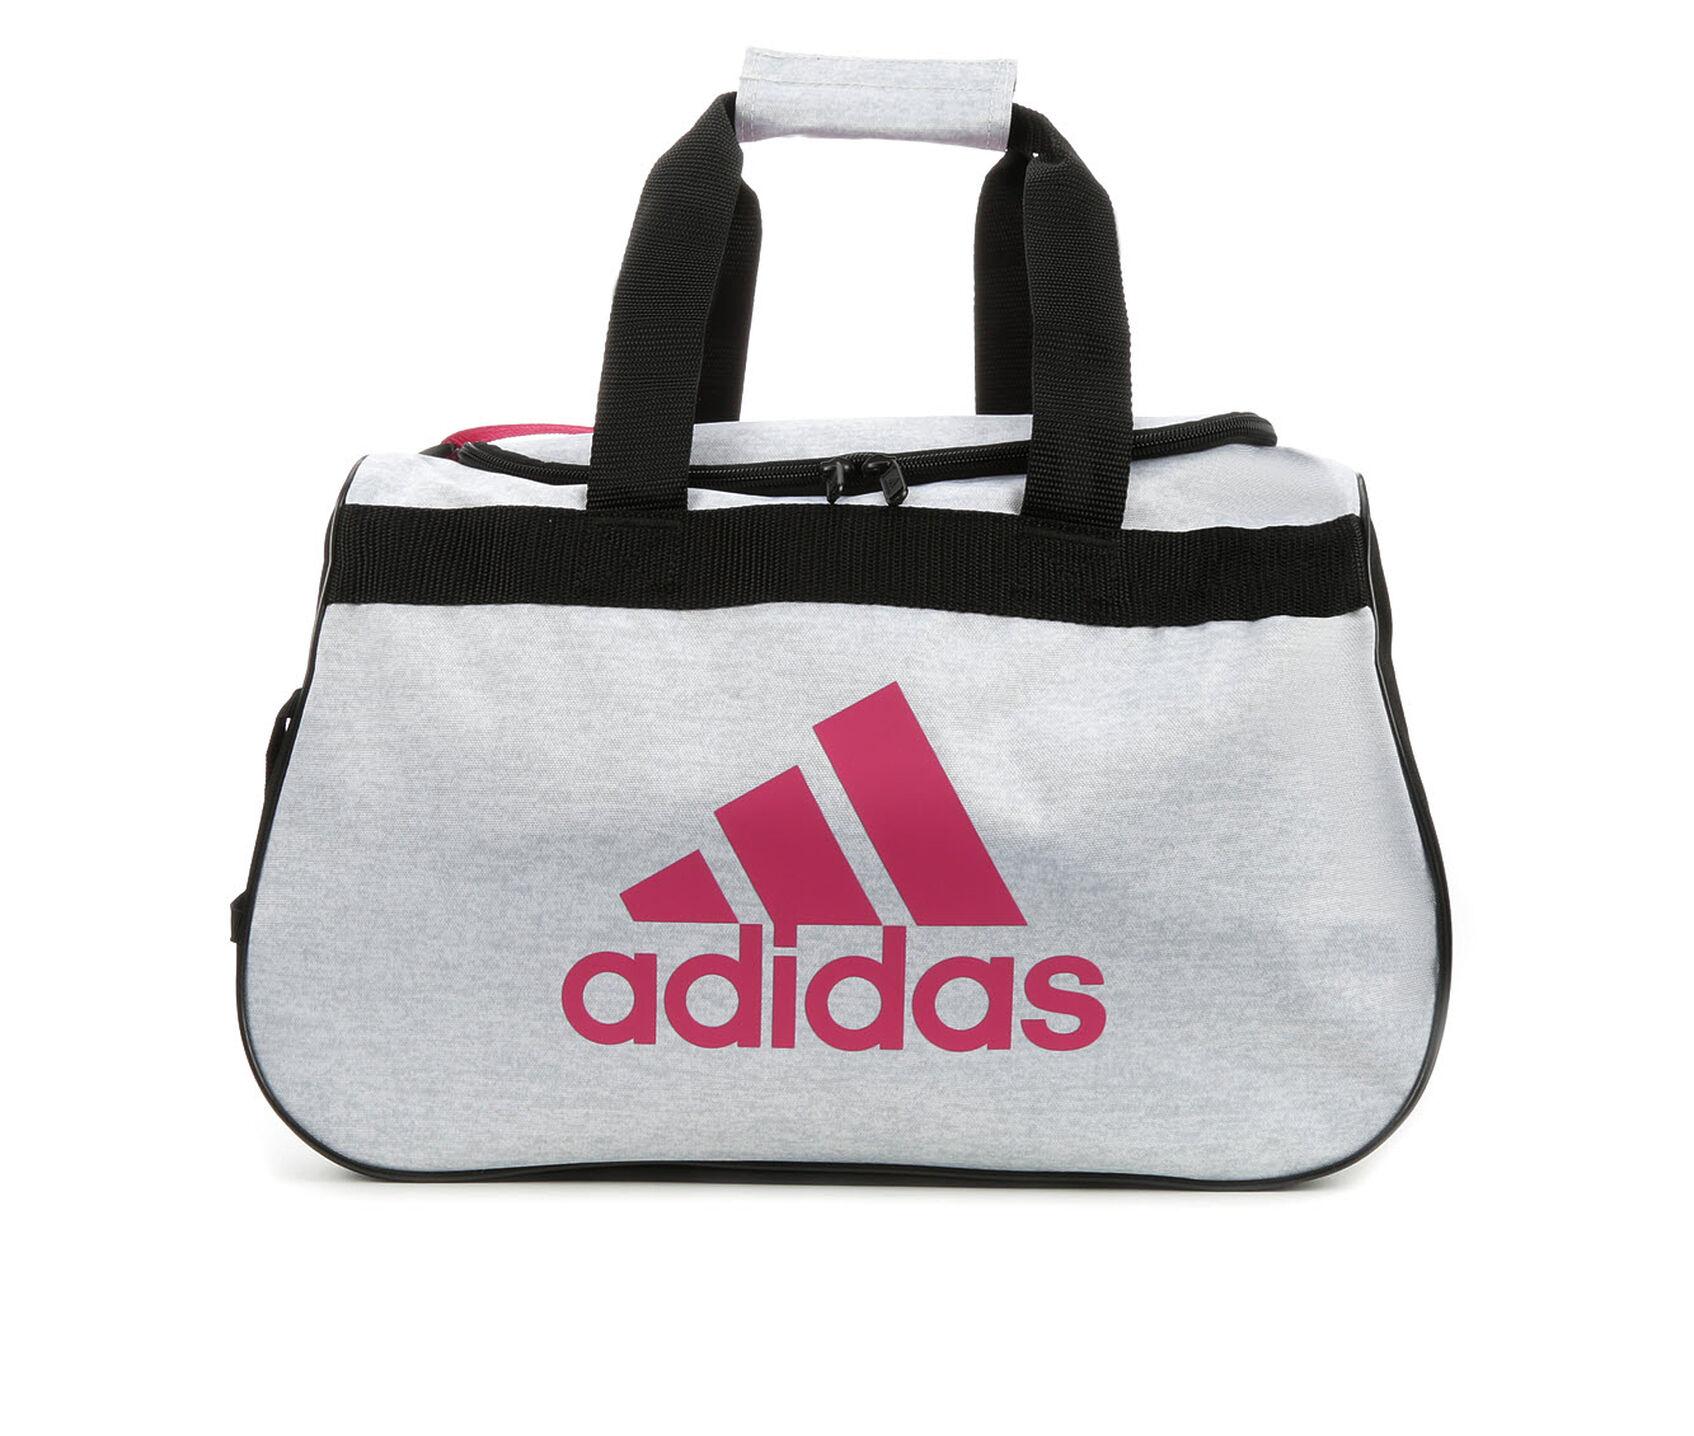 7939c9360 Adidas Diablo Small Duffel Bag | Shoe Carnival